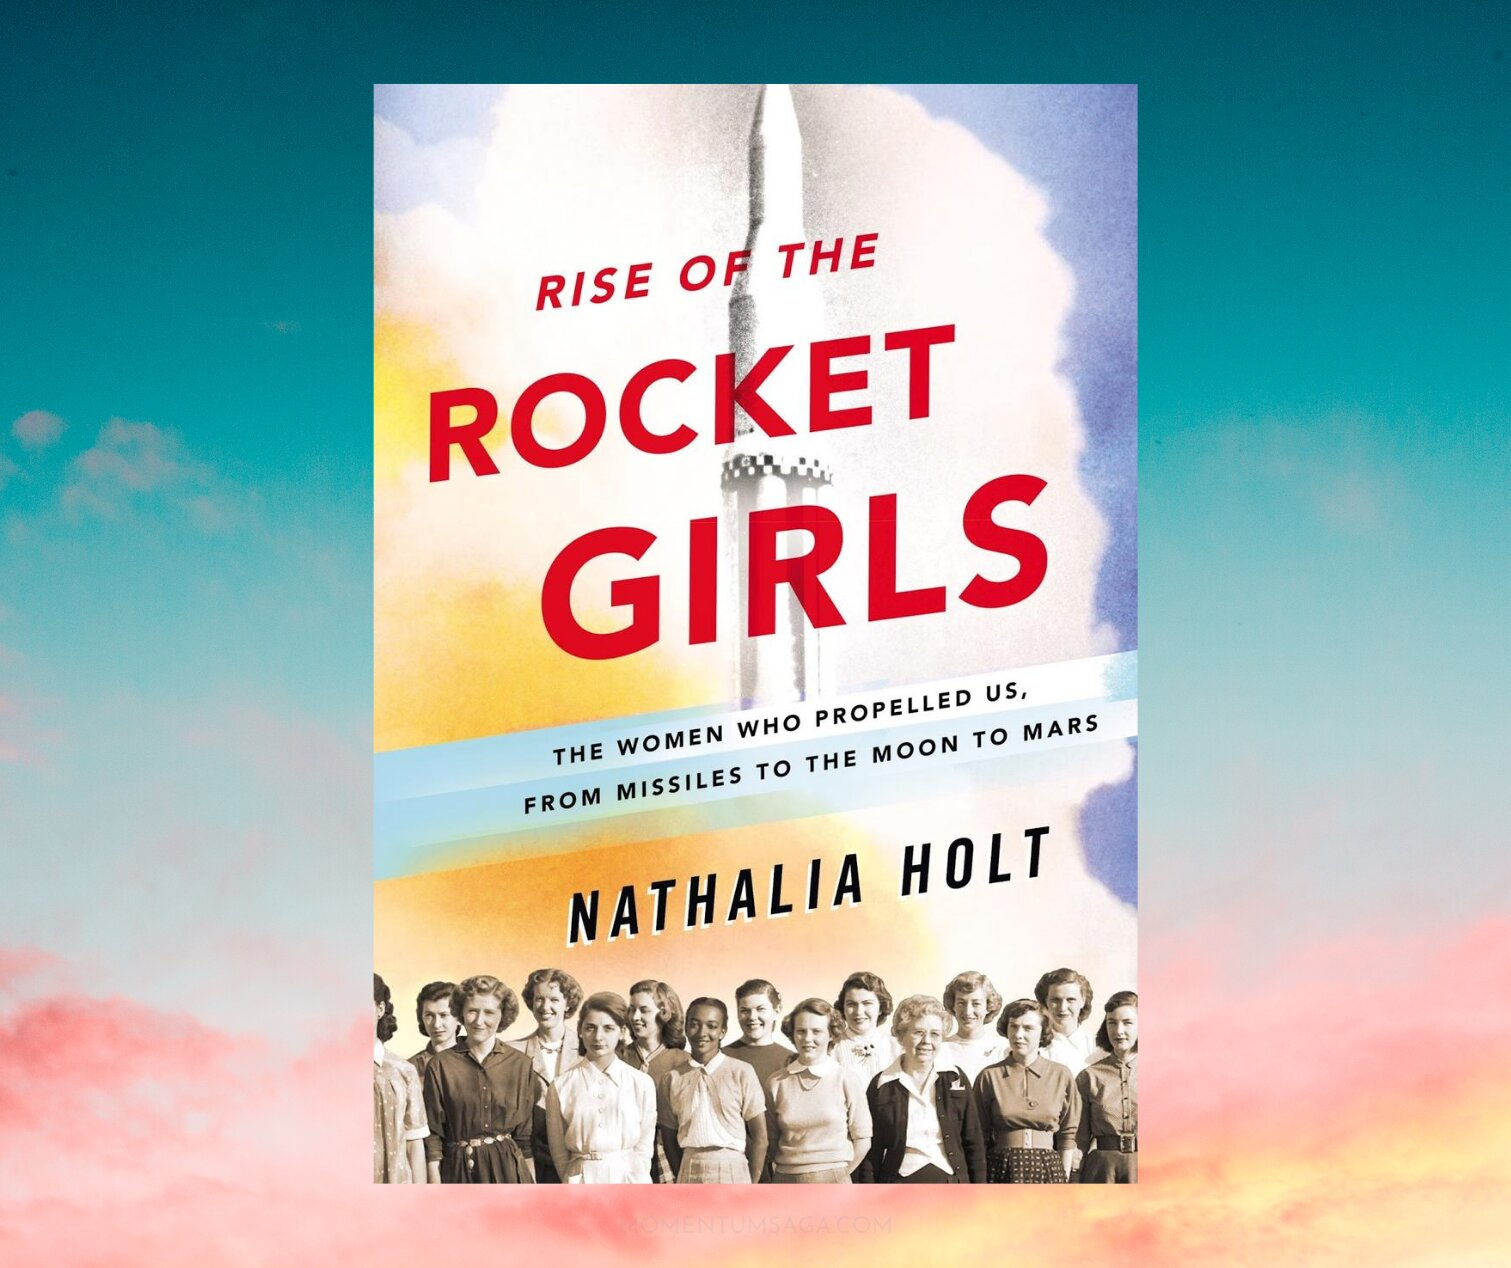 Resenha: Rise of the Rocket Girls, de Nathalia Holt